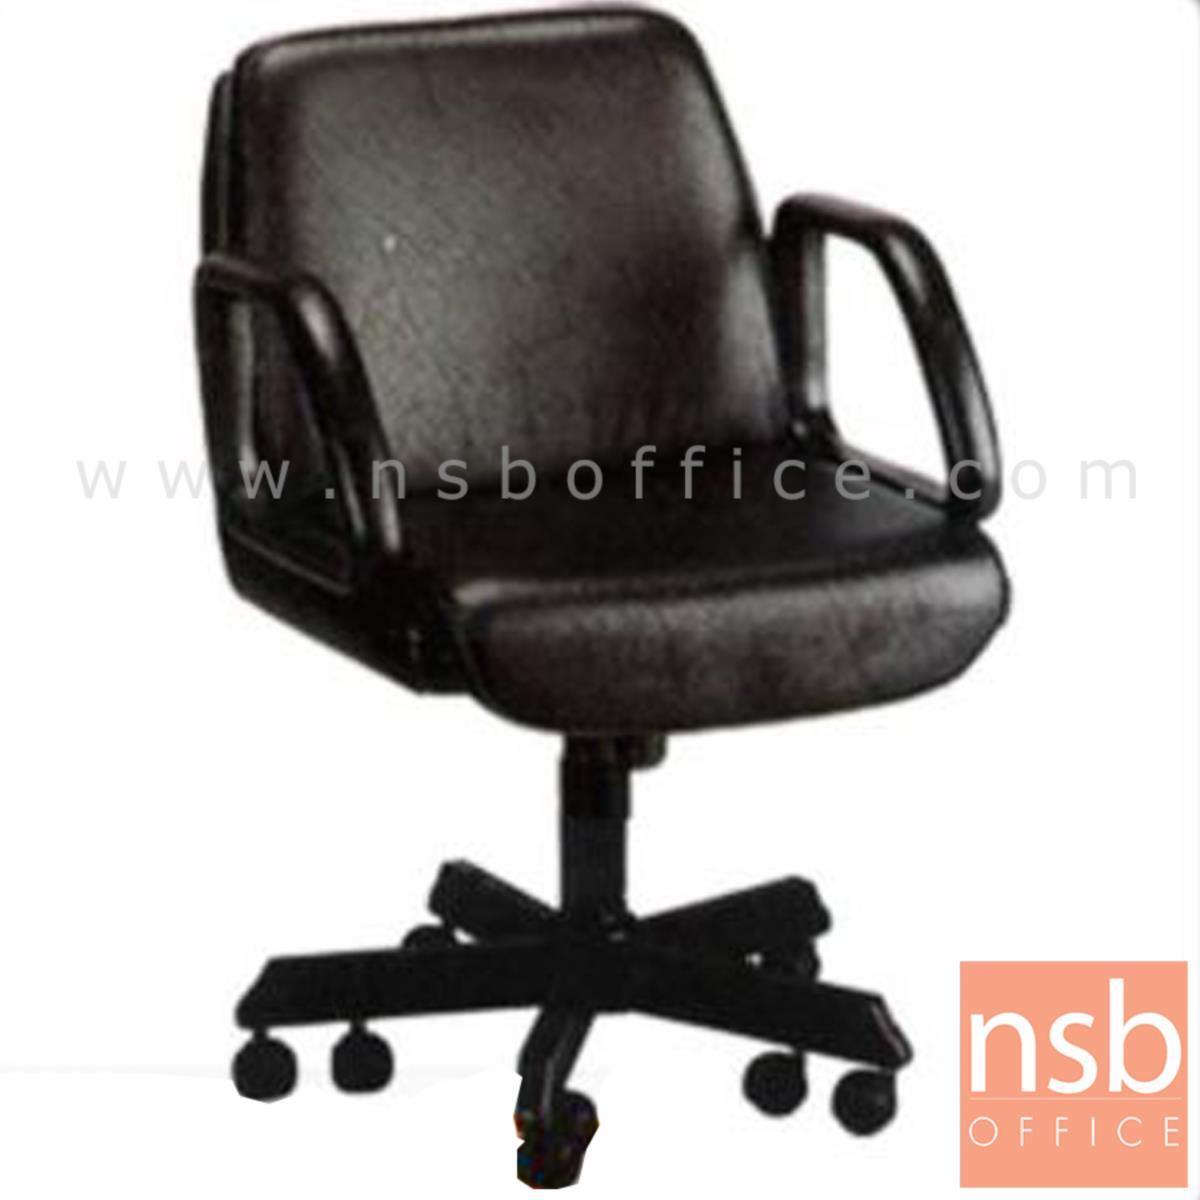 B14A014:เก้าอี้สำนักงาน รุ่น Partridge (พาร์ทิจ)  มีก้อนโยก ขาเหล็ก 10 ล้อ